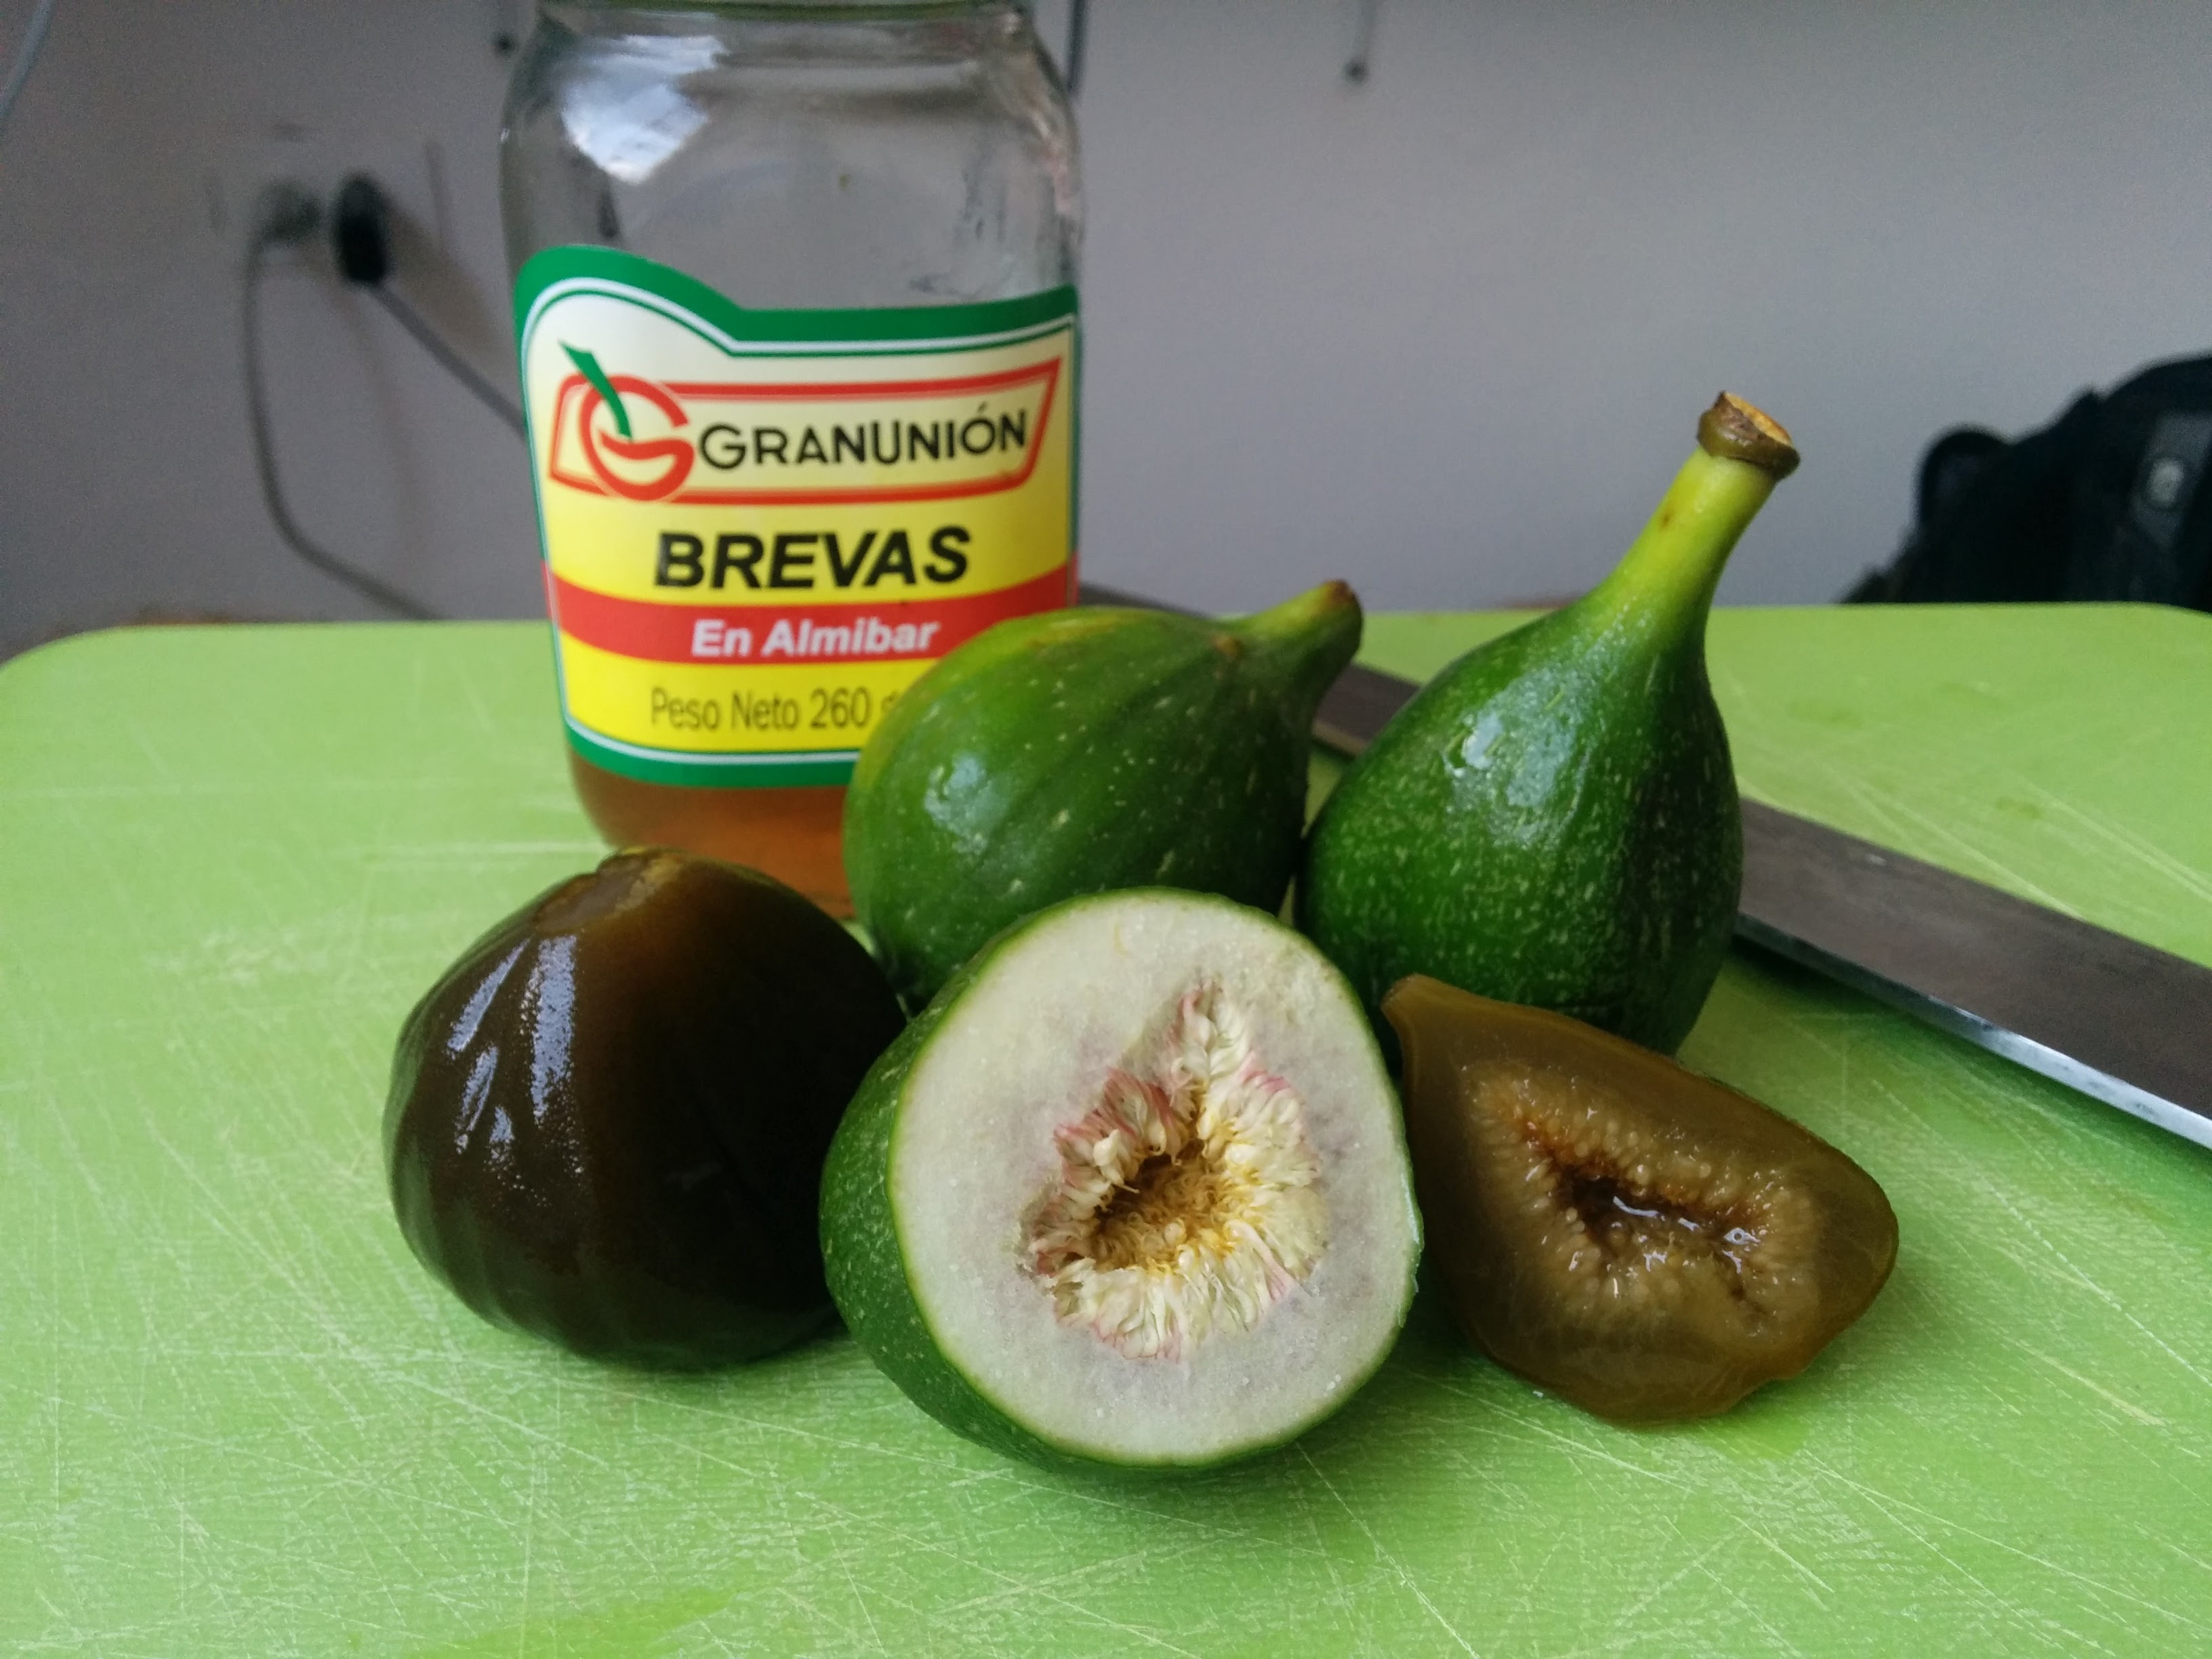 colombian figs - brevas